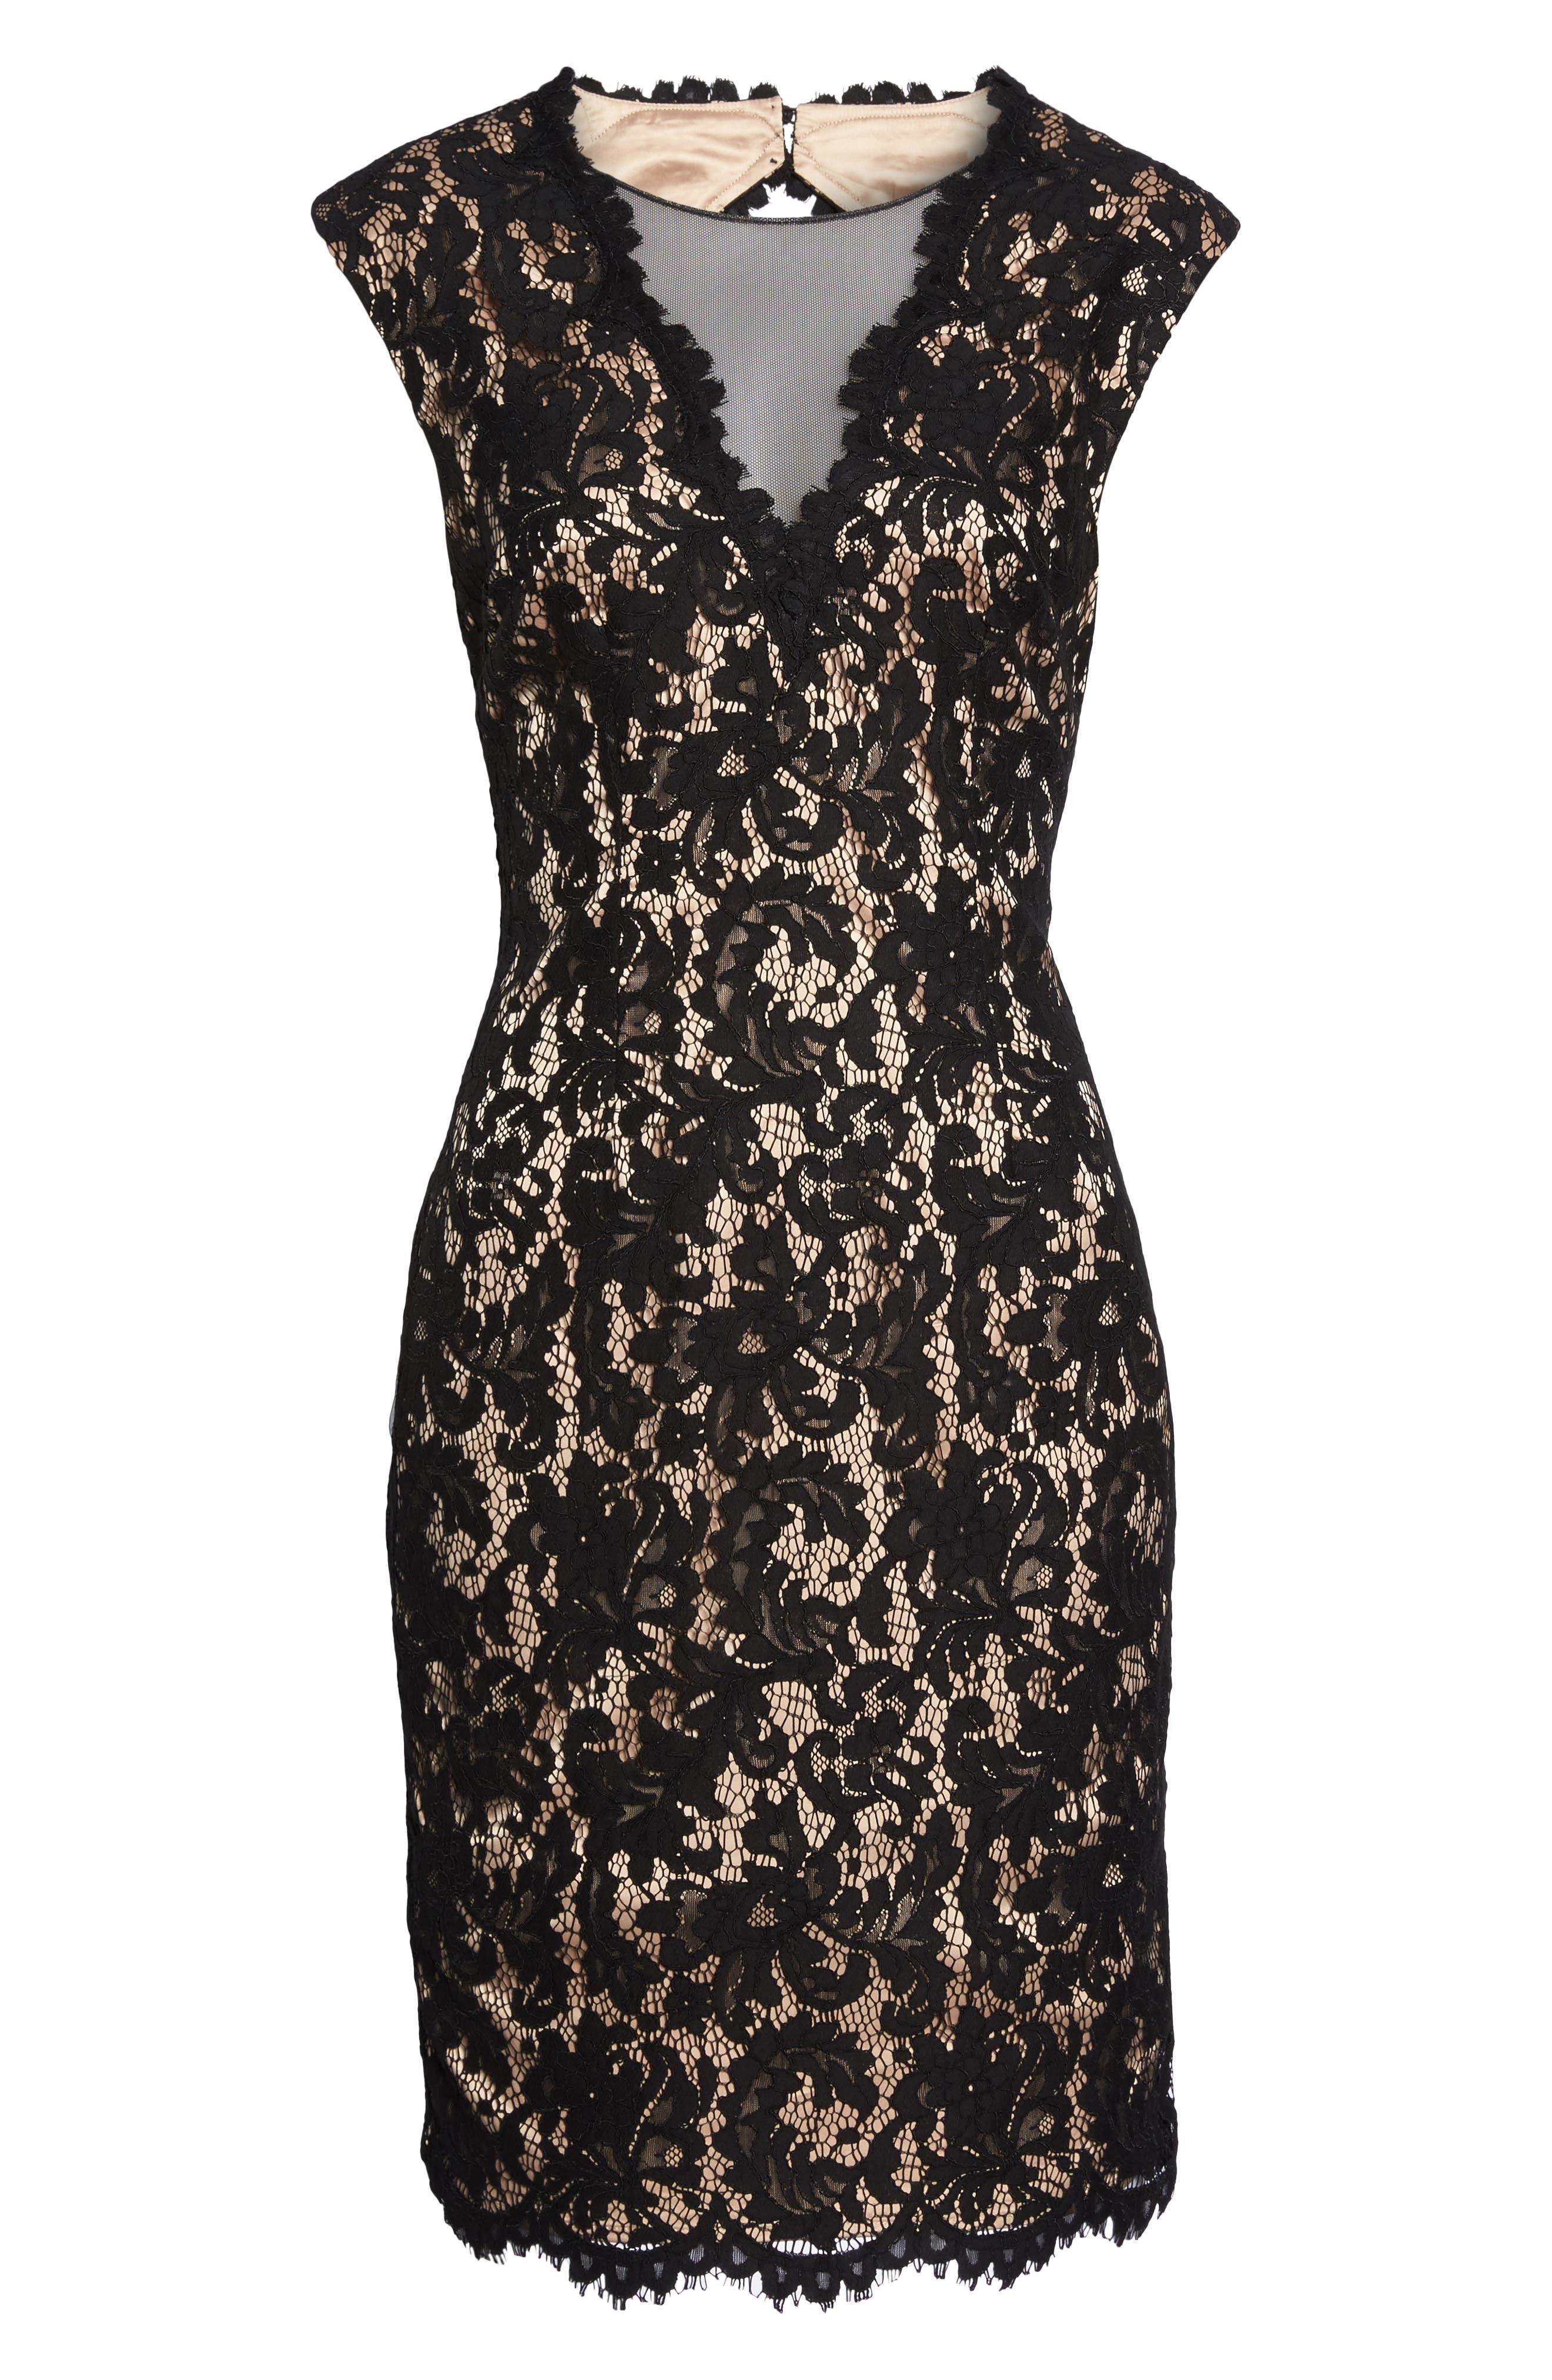 Illusion Lace Sheath Dress,                             Alternate thumbnail 7, color,                             015